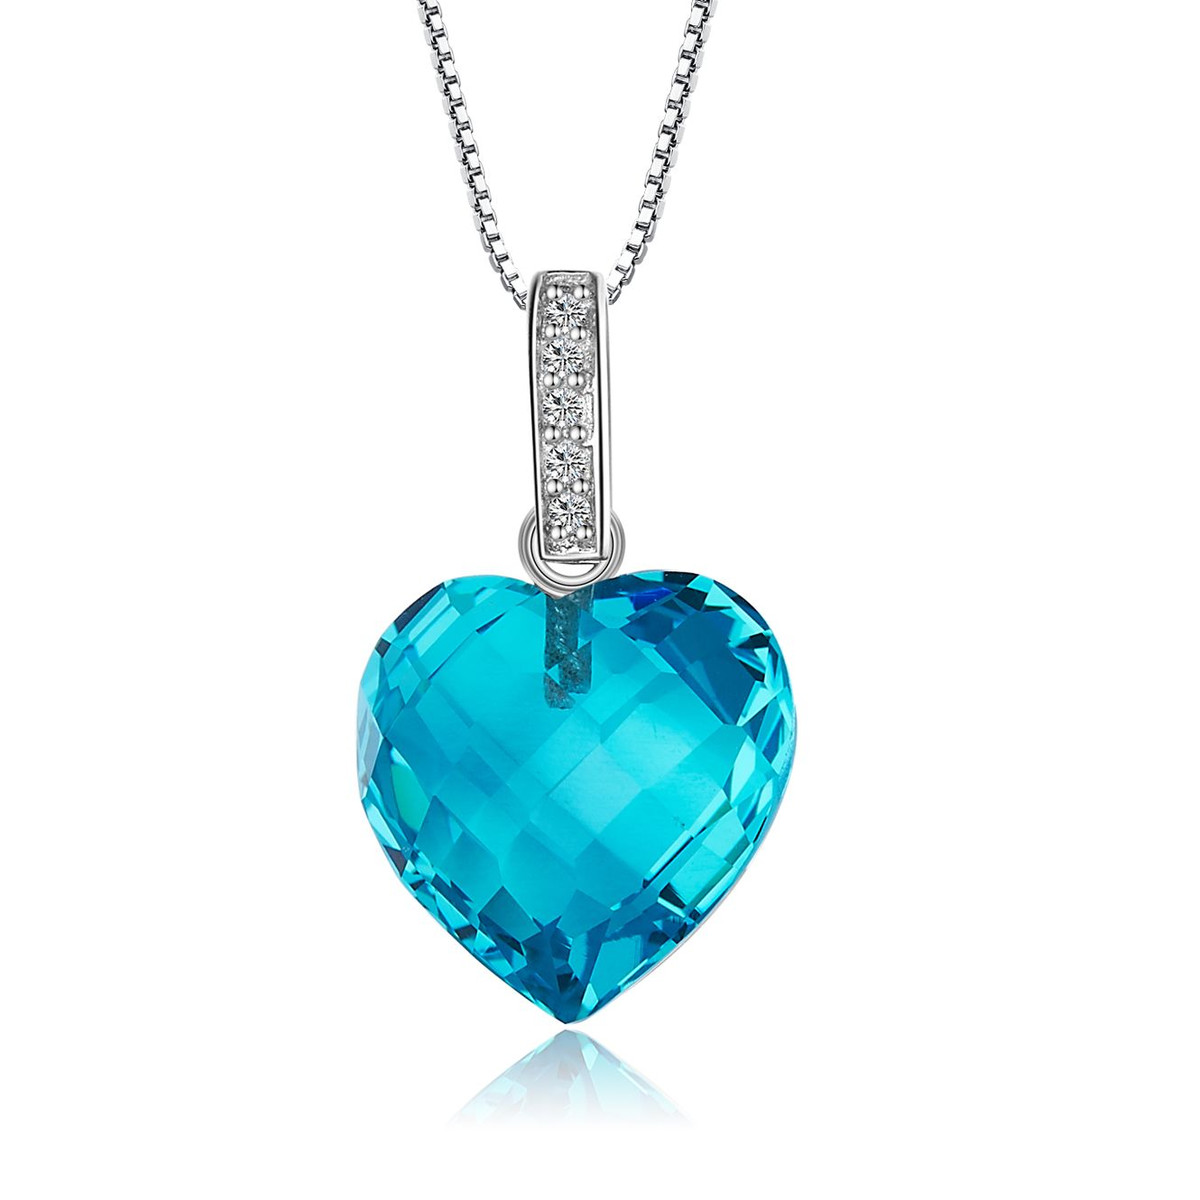 collier femme bleu turquoise